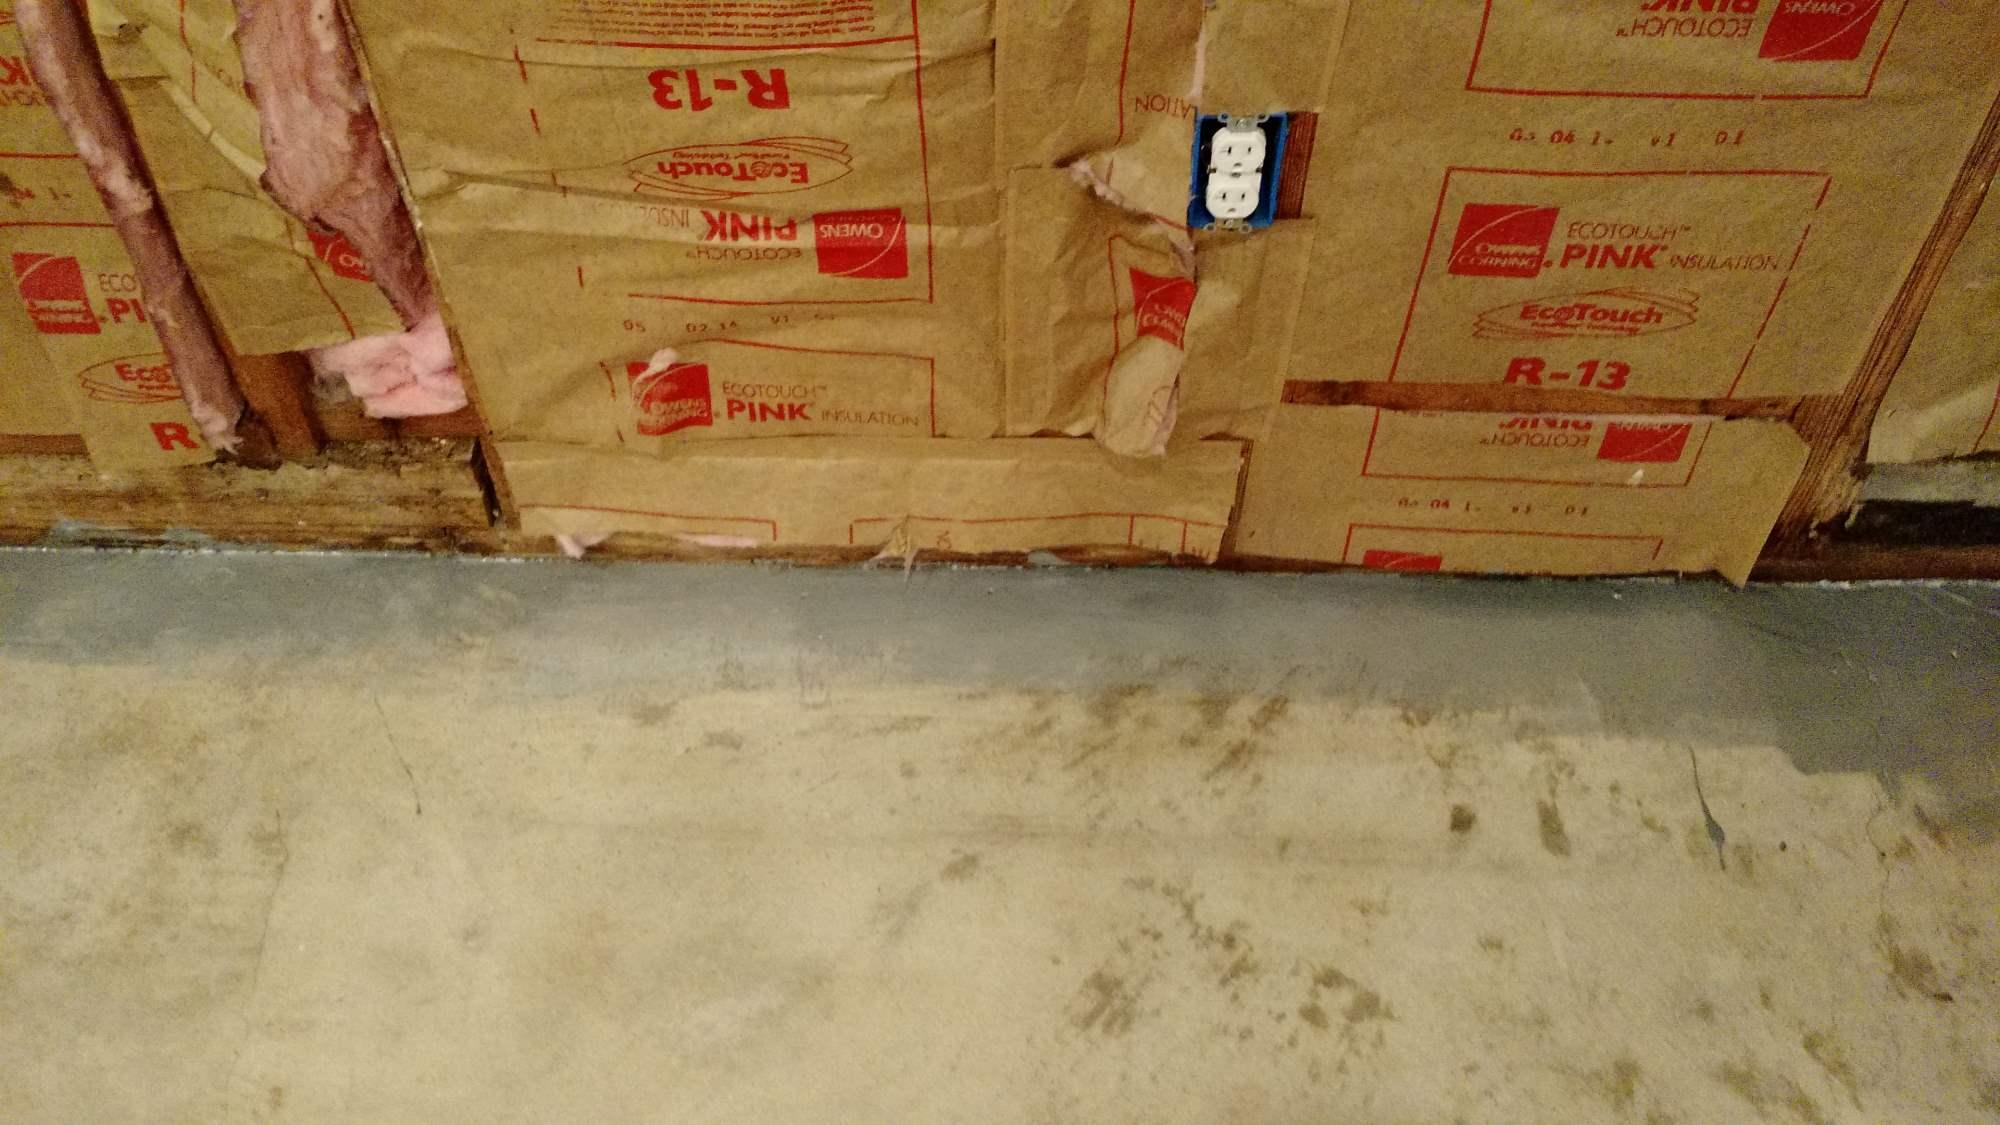 hyloft ceiling storage instructions